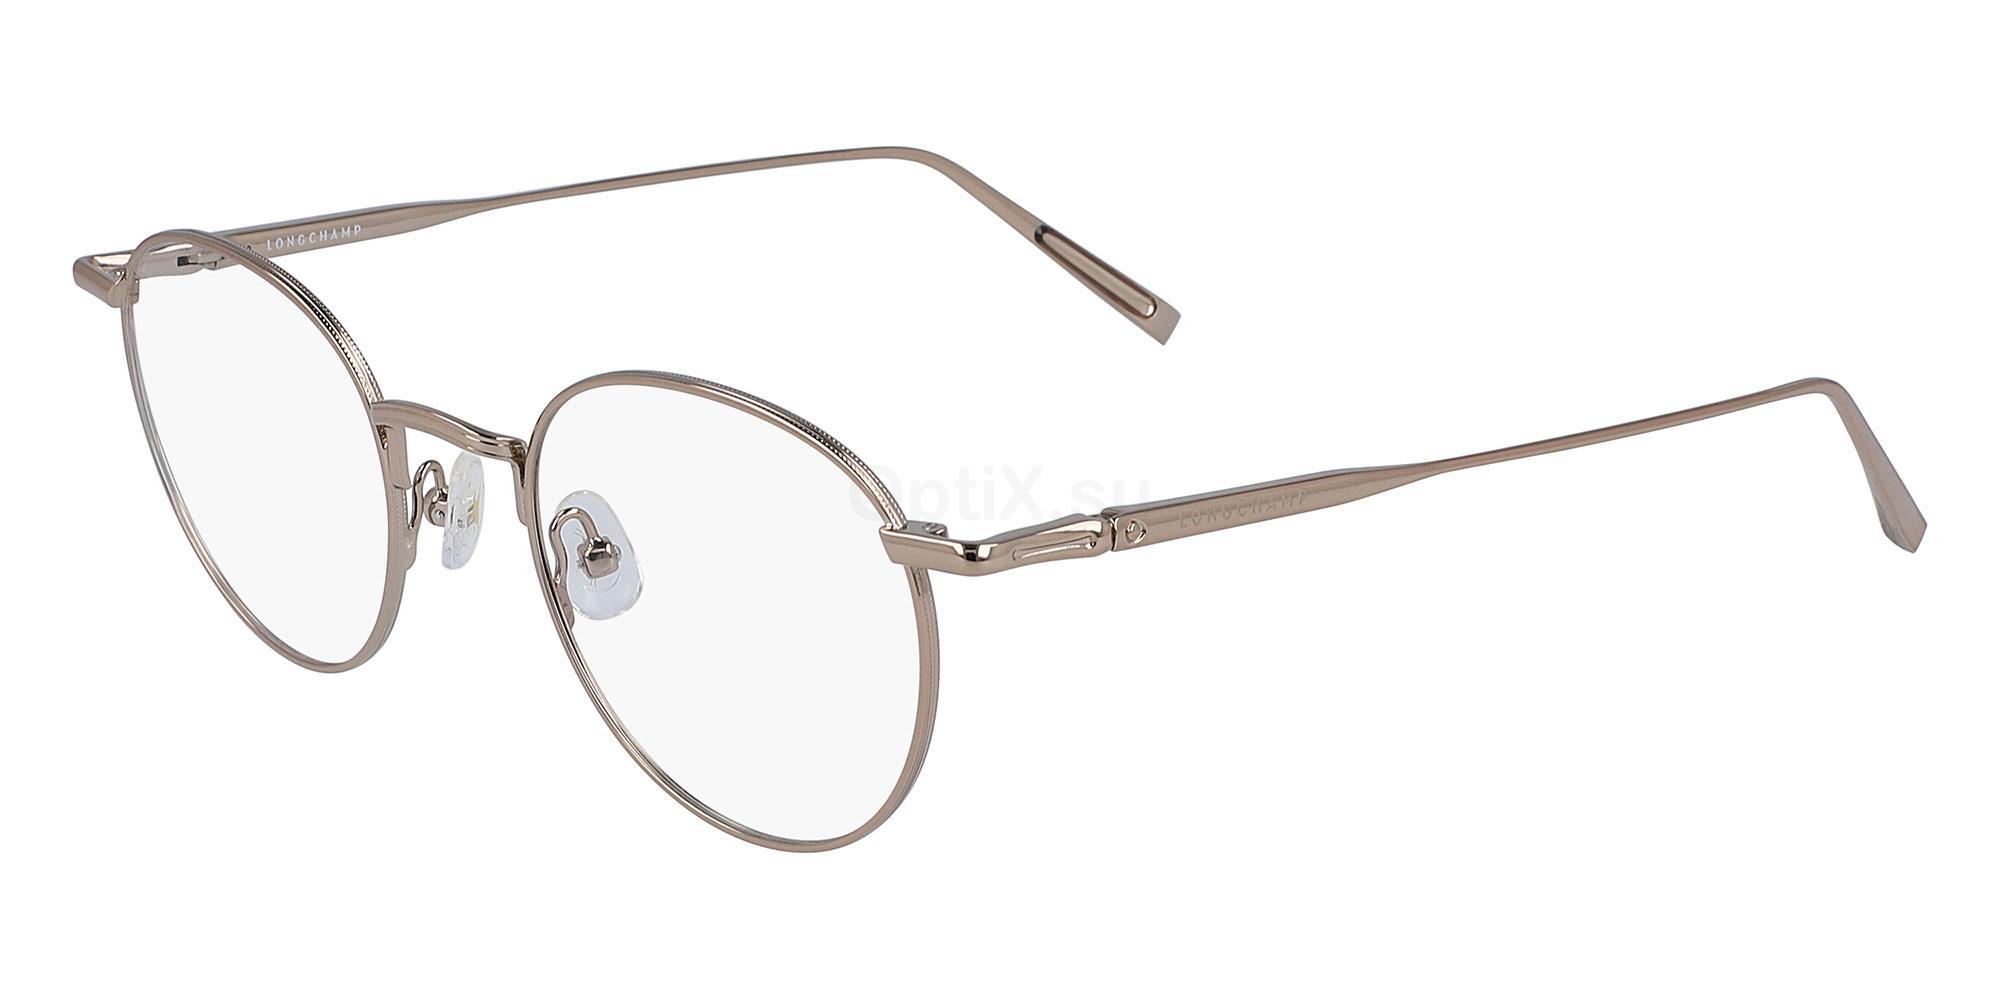 225 LO2112 Glasses, LONGCHAMP